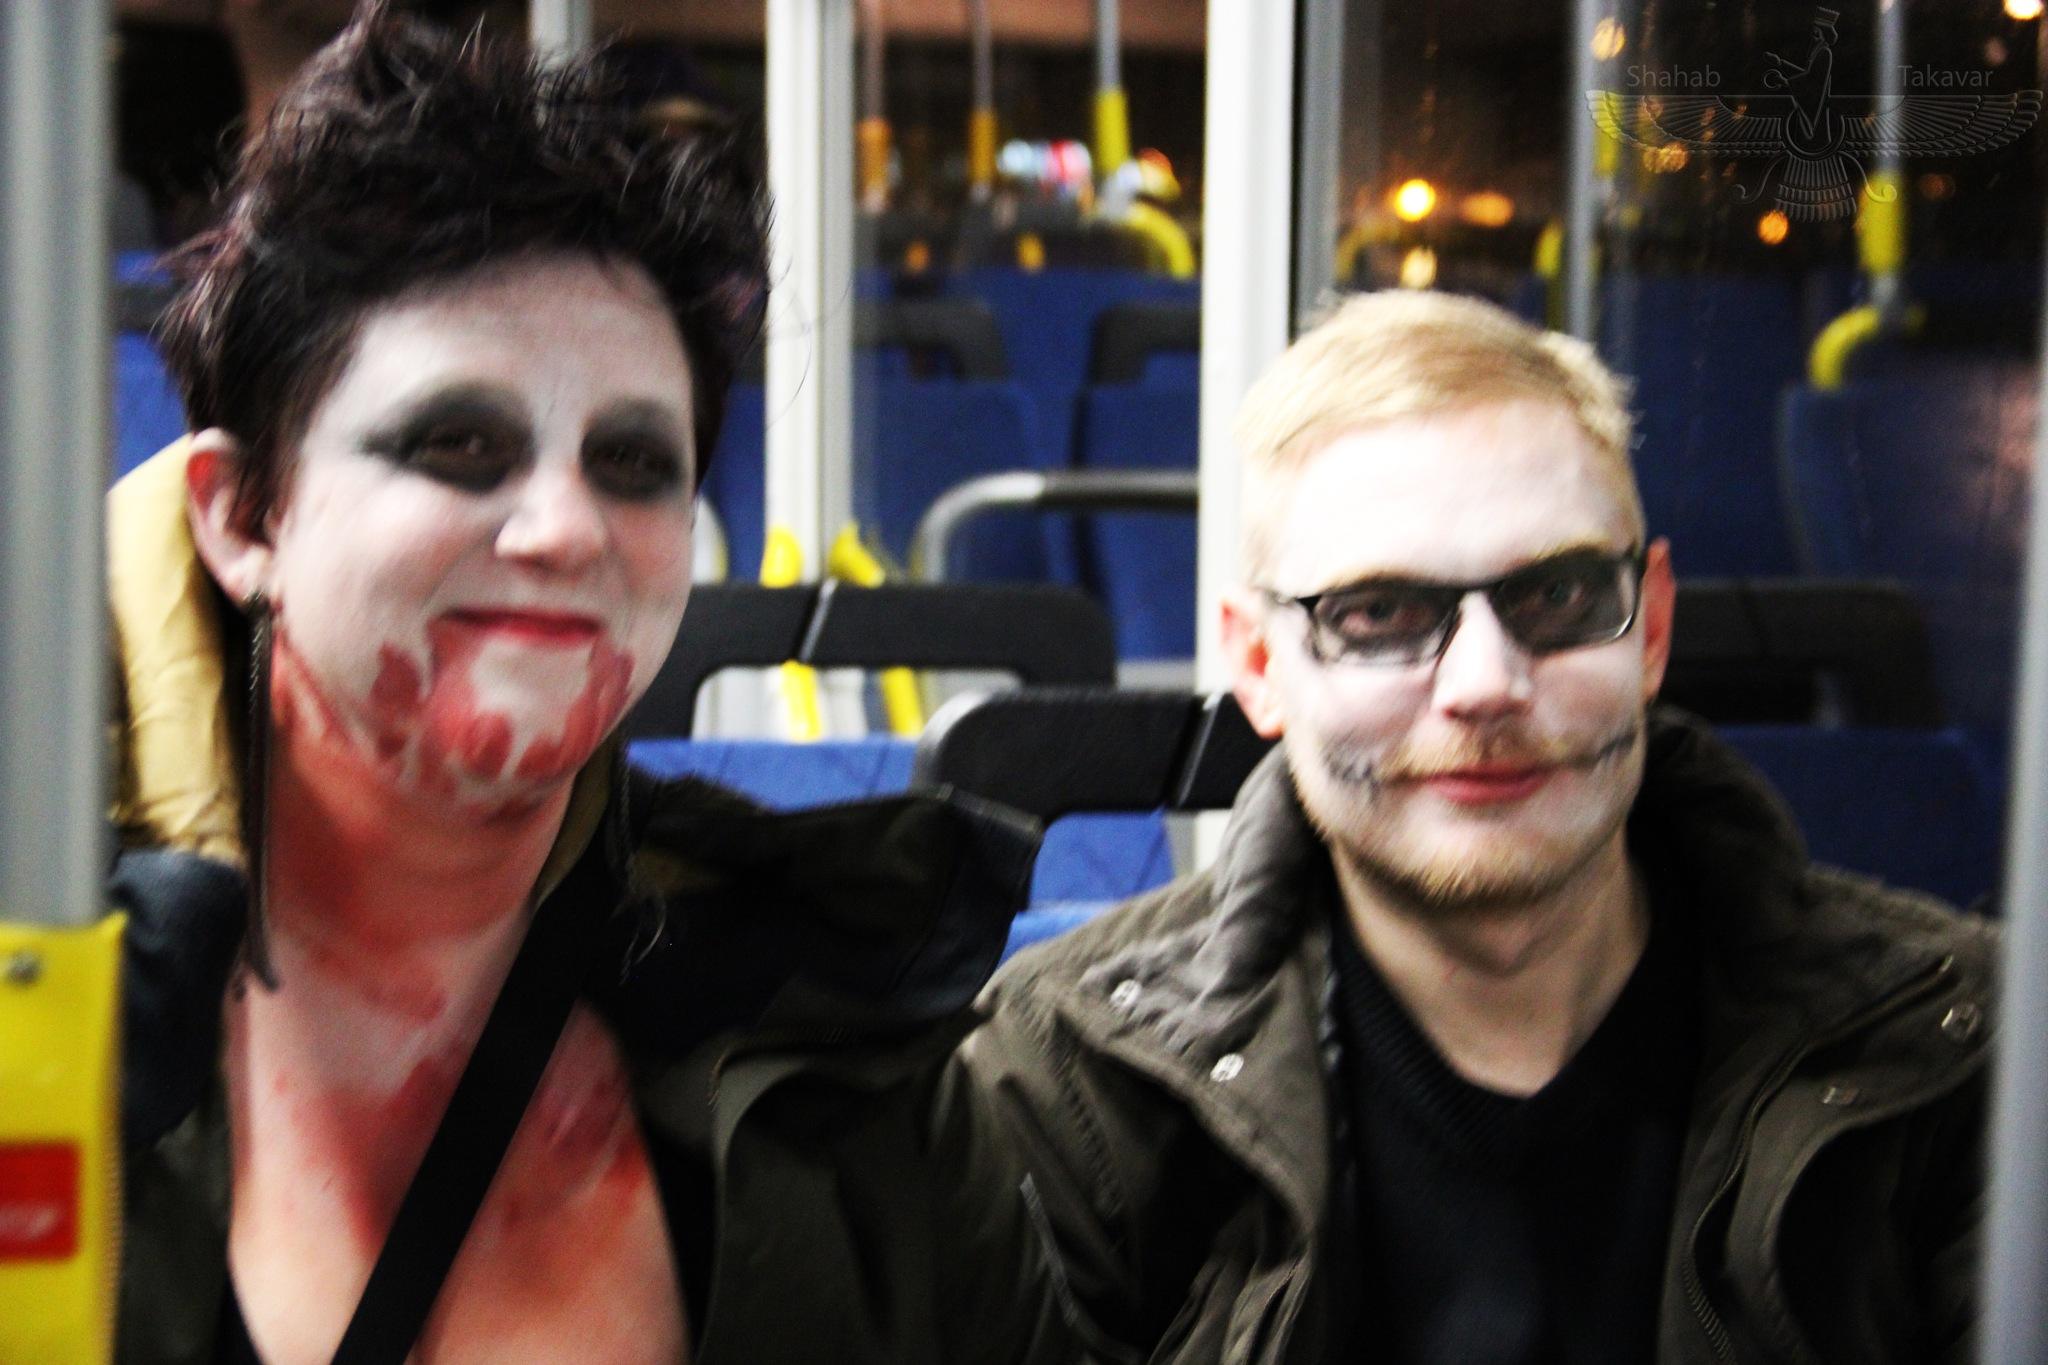 Halloween life by strangerwriter